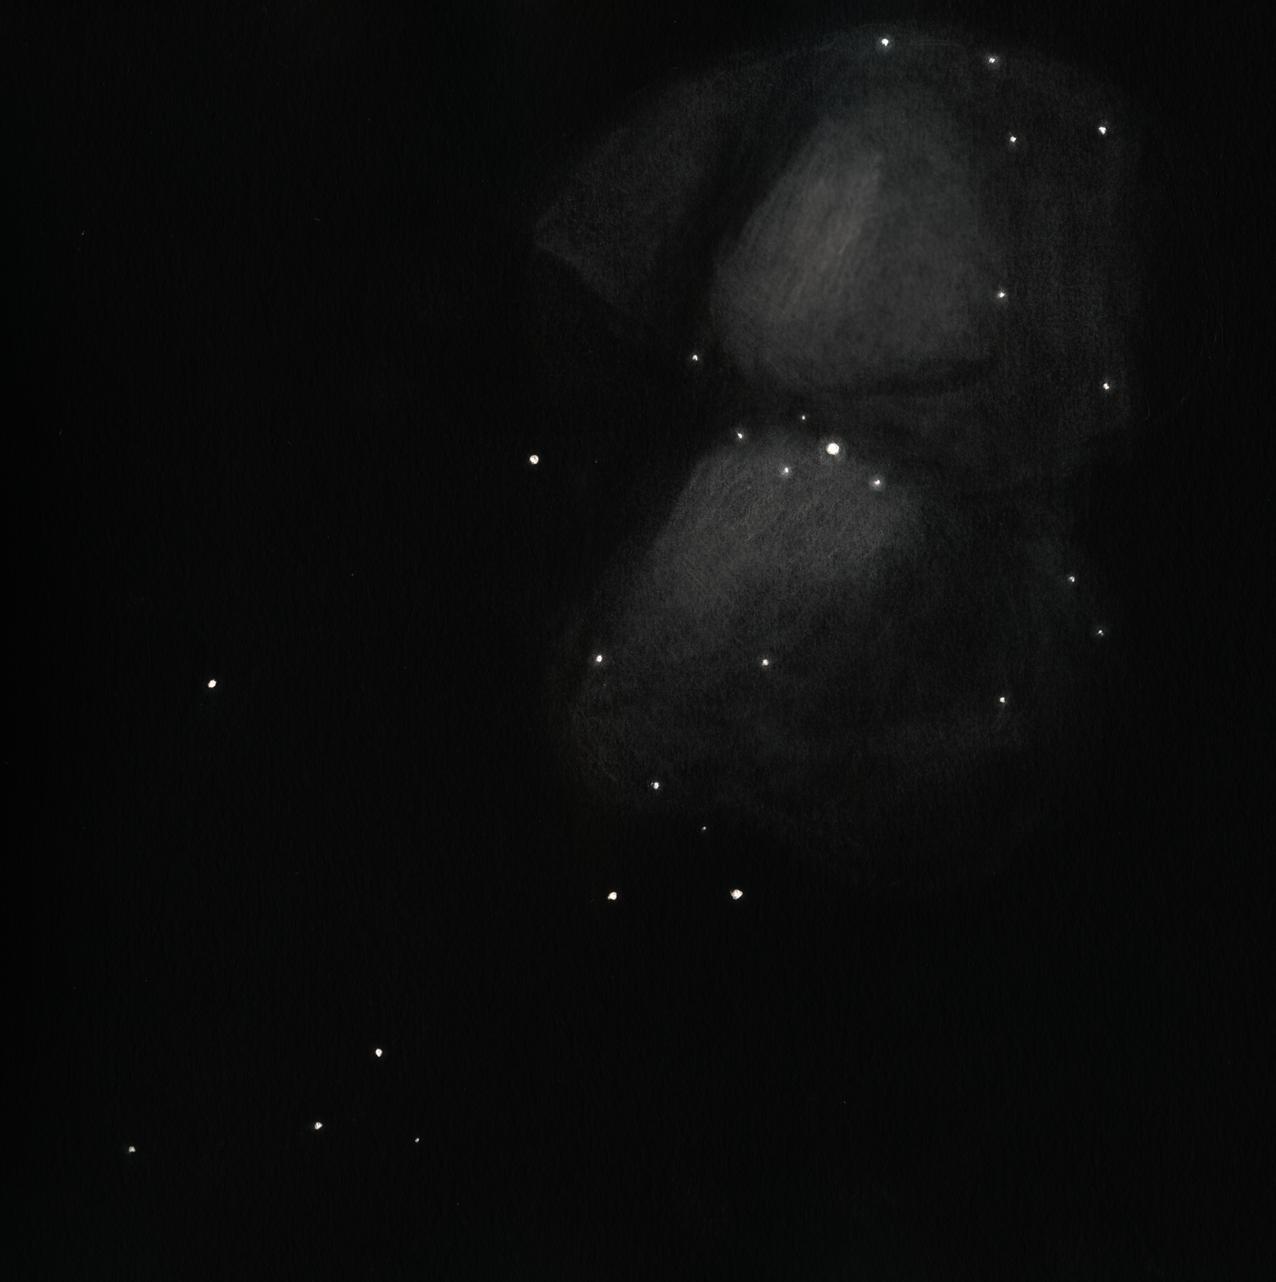 NGC_281_2020-09-08_20-00_T400x83_OIII_gbe_small.png.90dbd536127e9b2b2403646ceb5052e3.png